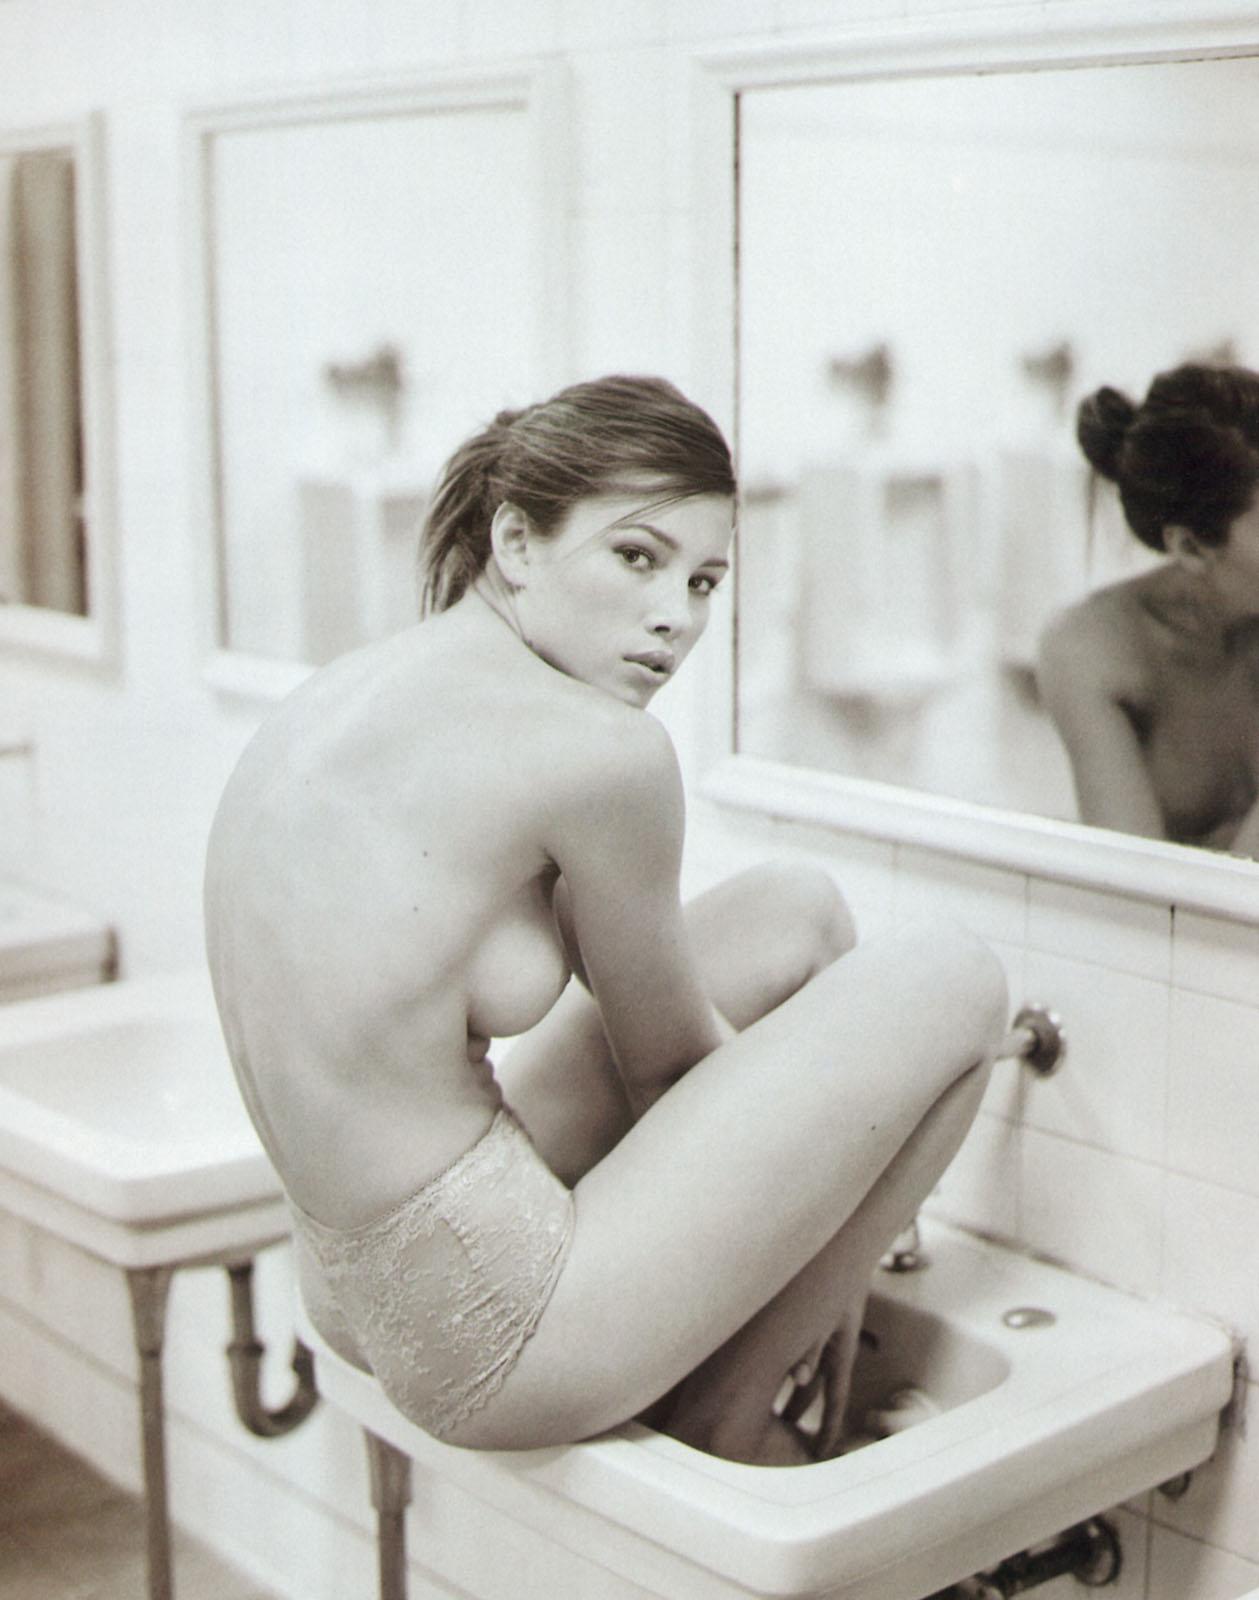 alison dunbar nude pics